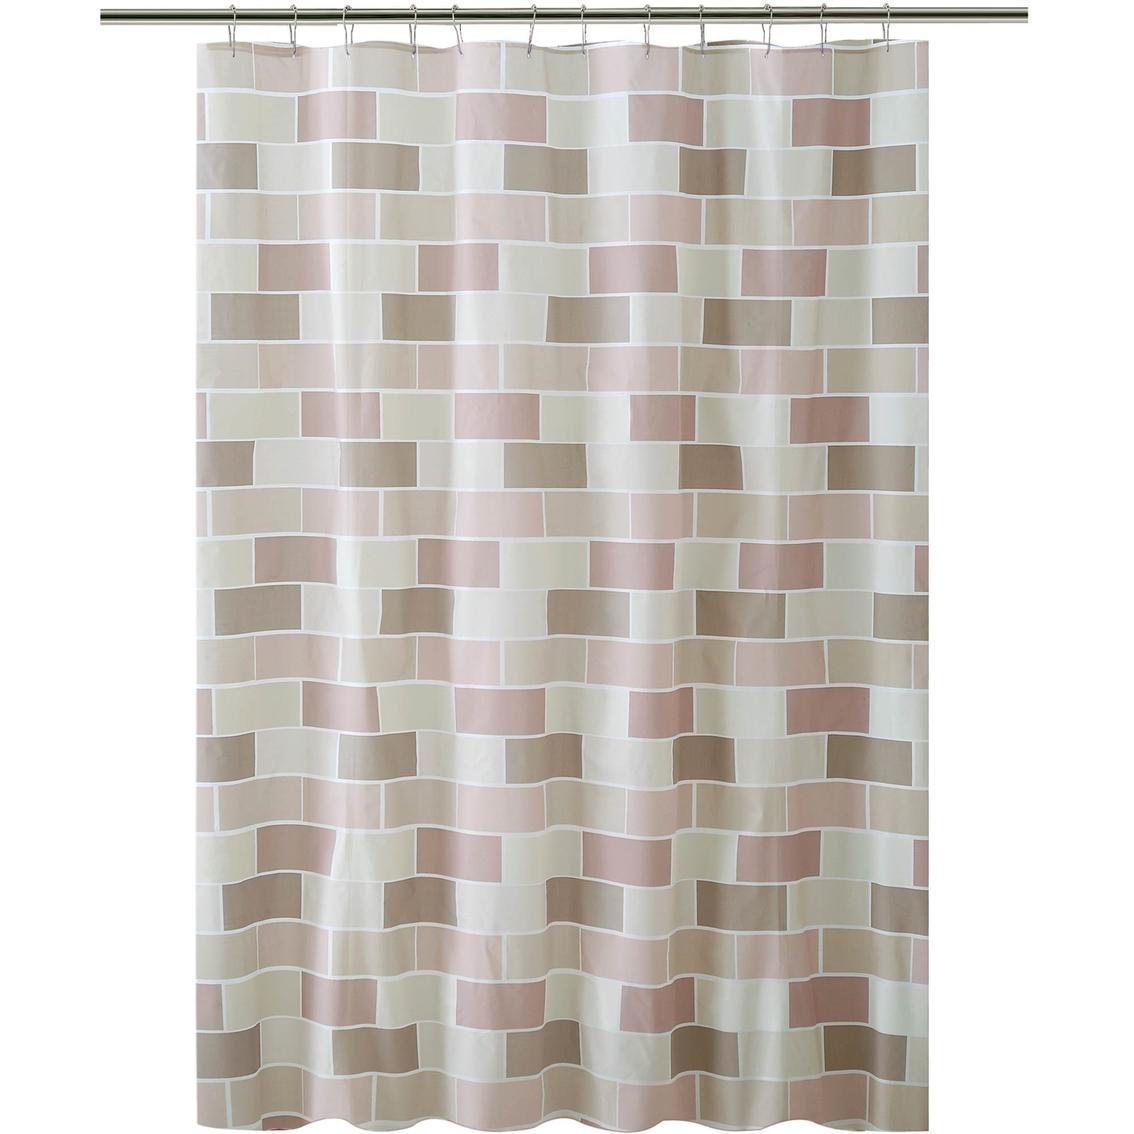 Bath Bliss Tile Design Shower Curtain Shower Curtains Hooks